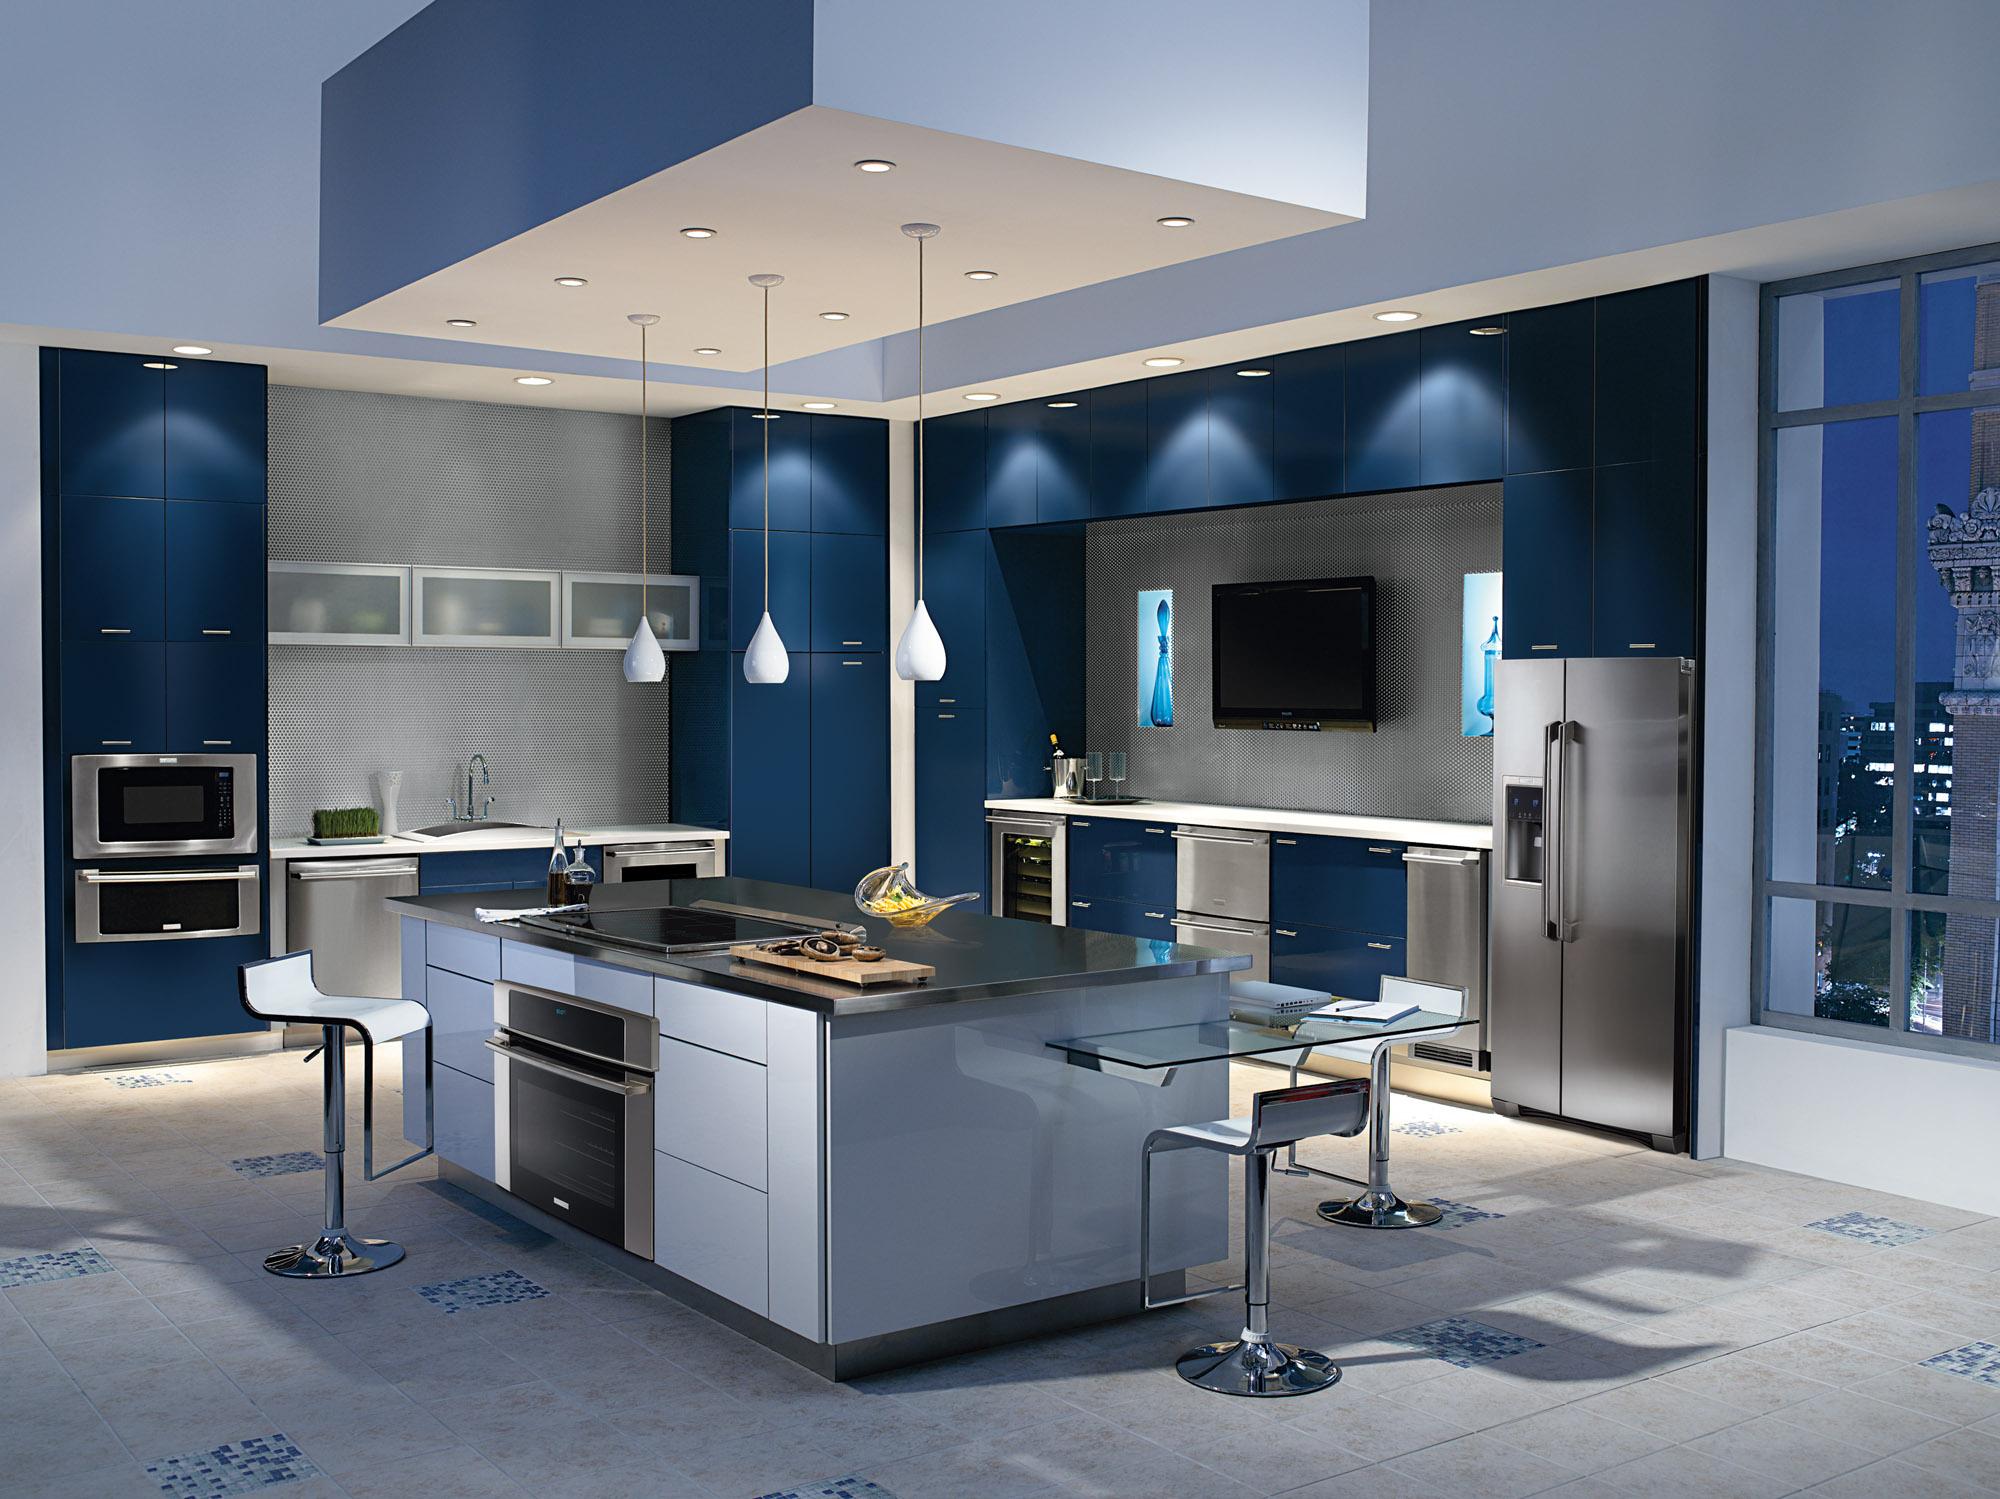 Cuisine Interieur Design